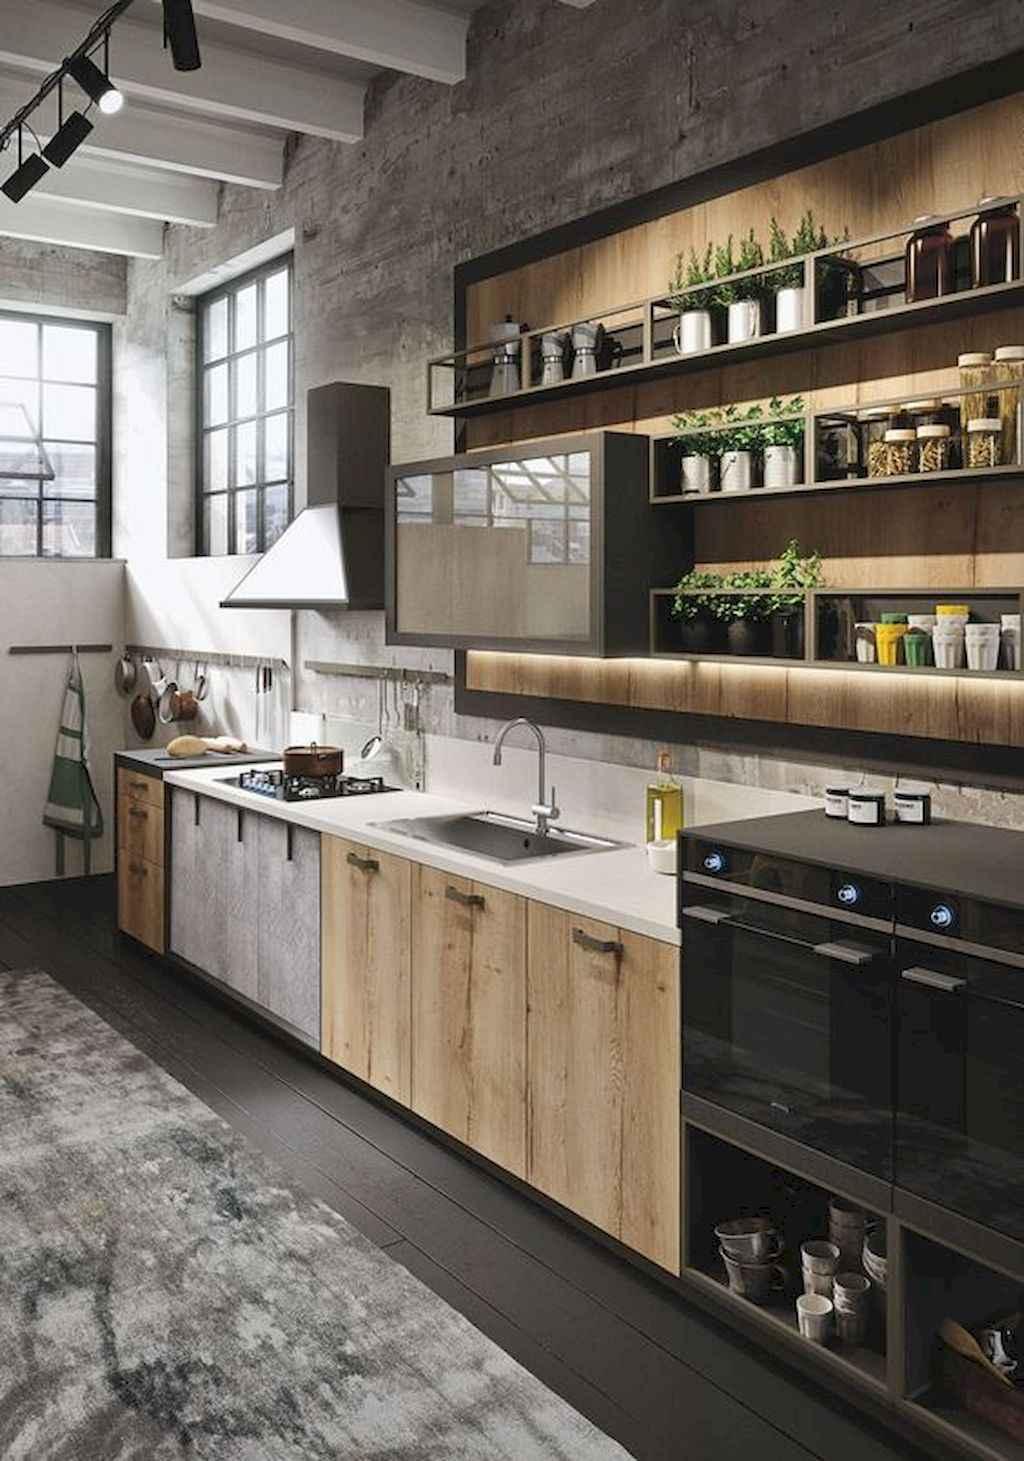 120 modern rustic farmhouse kitchen decor ideas 70 for 70s kitchen ideas